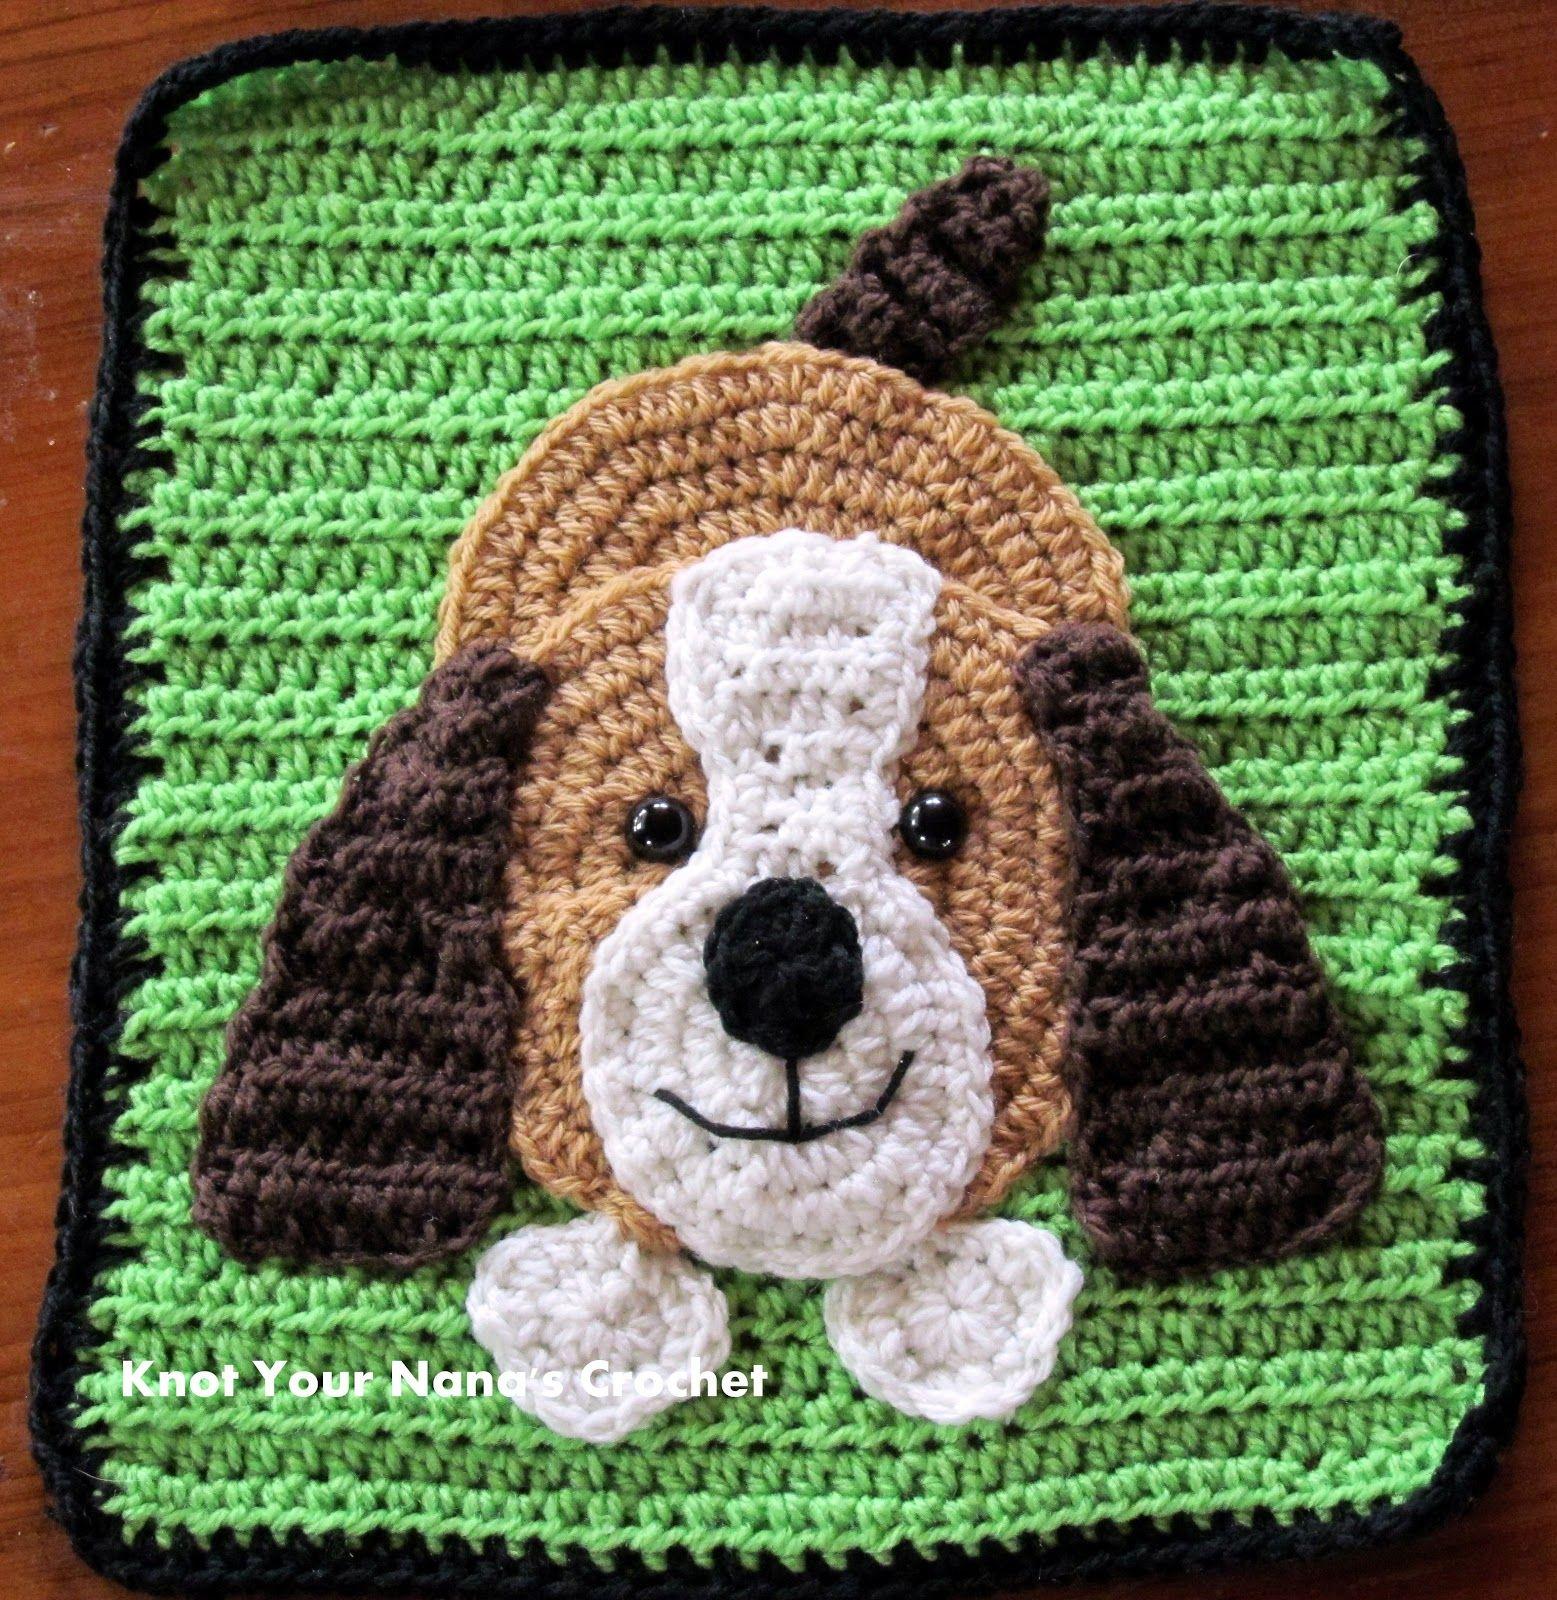 Knot Your Nana S Crochet Dog Crochet Pinterest